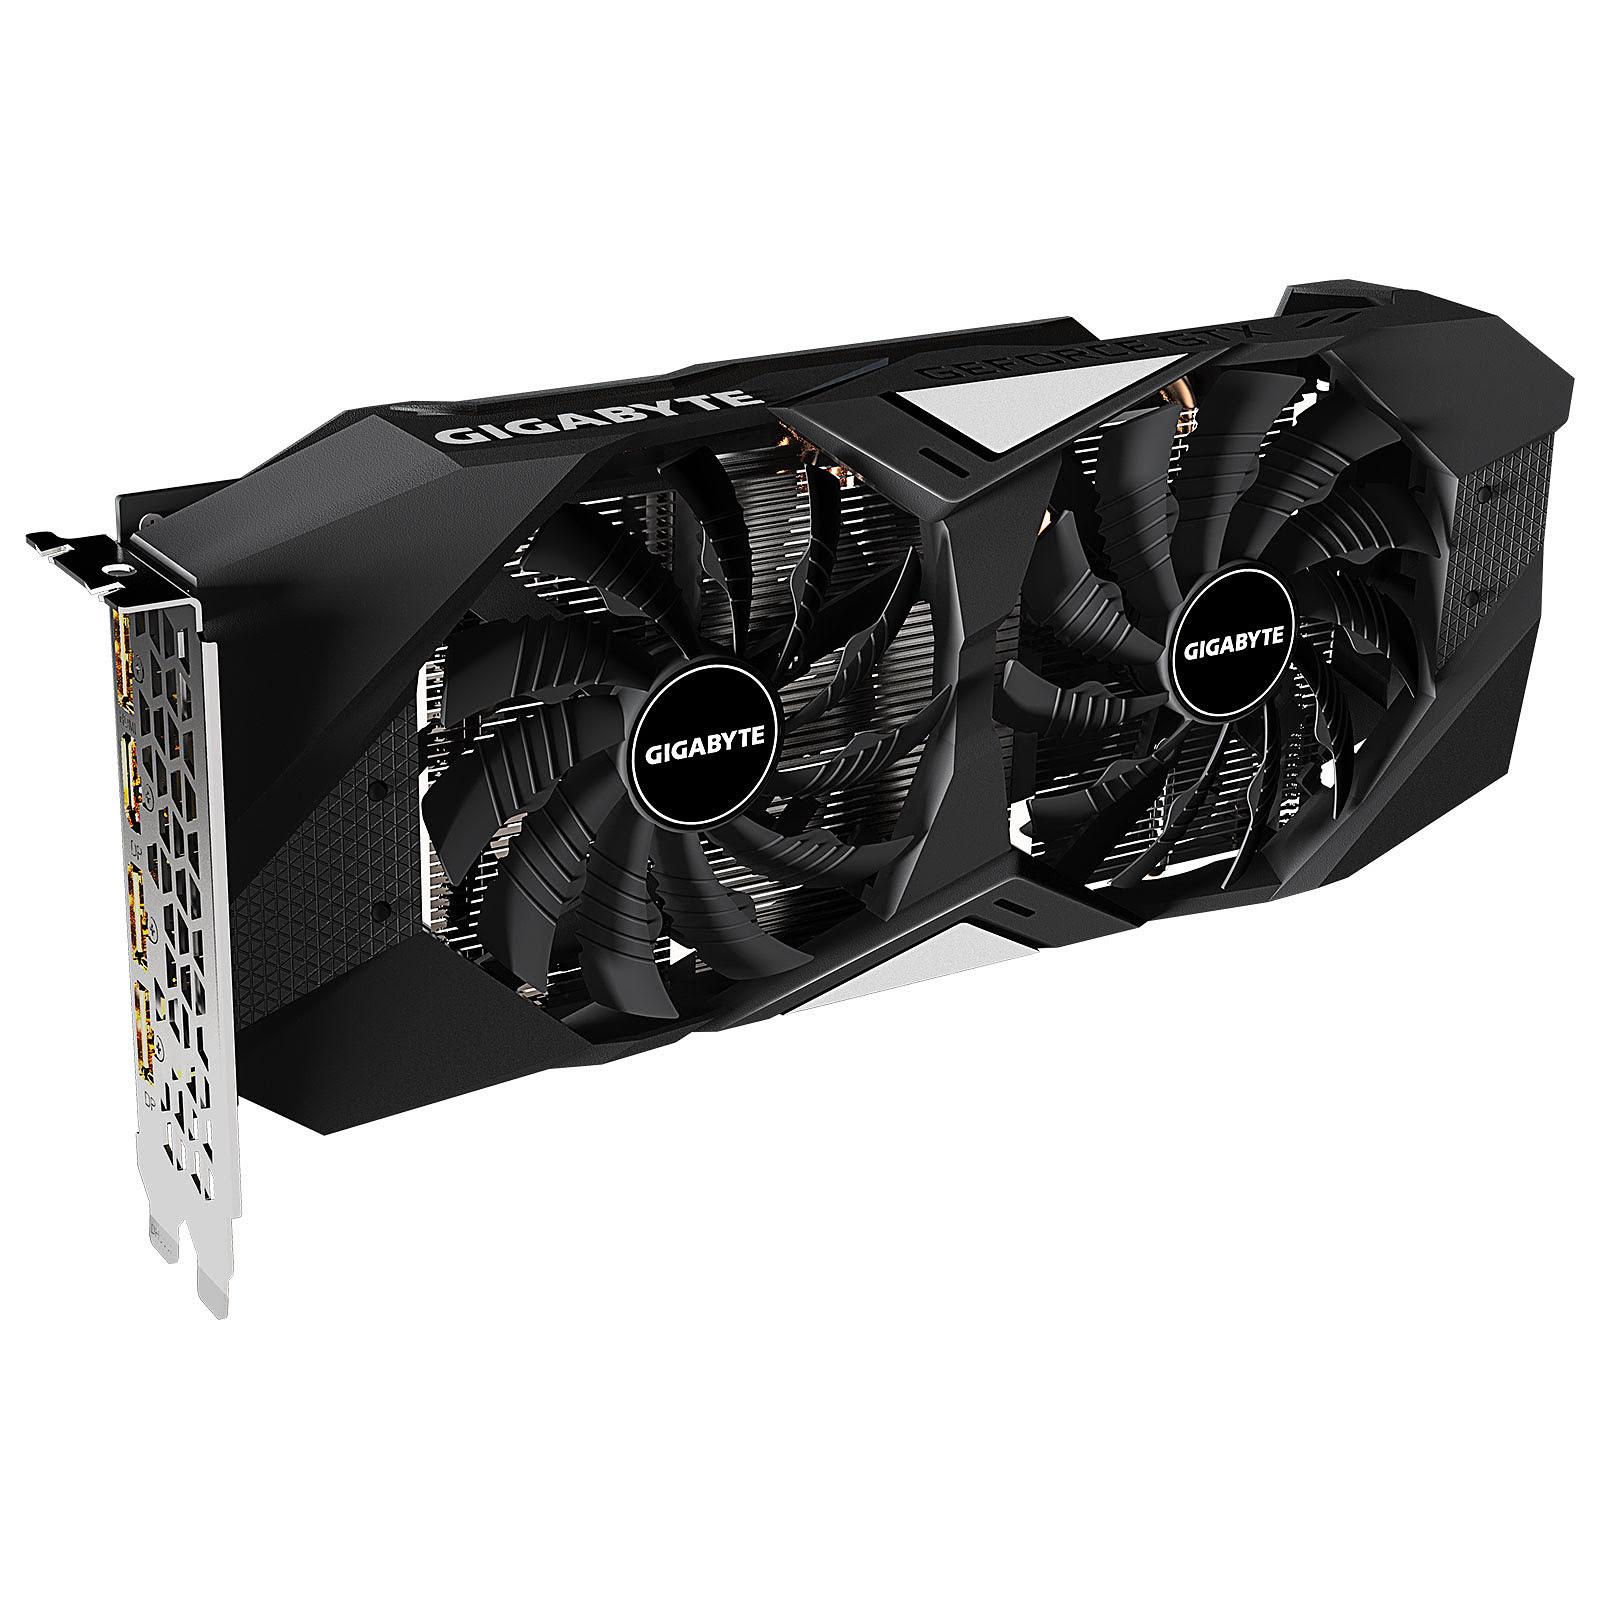 Gigabyte GeForce RTX 2060 SUPER WindForce OC 8G 2.0  (N206SWF2OC-8GD) - Achat / Vente Carte graphique sur Cybertek.fr - 4